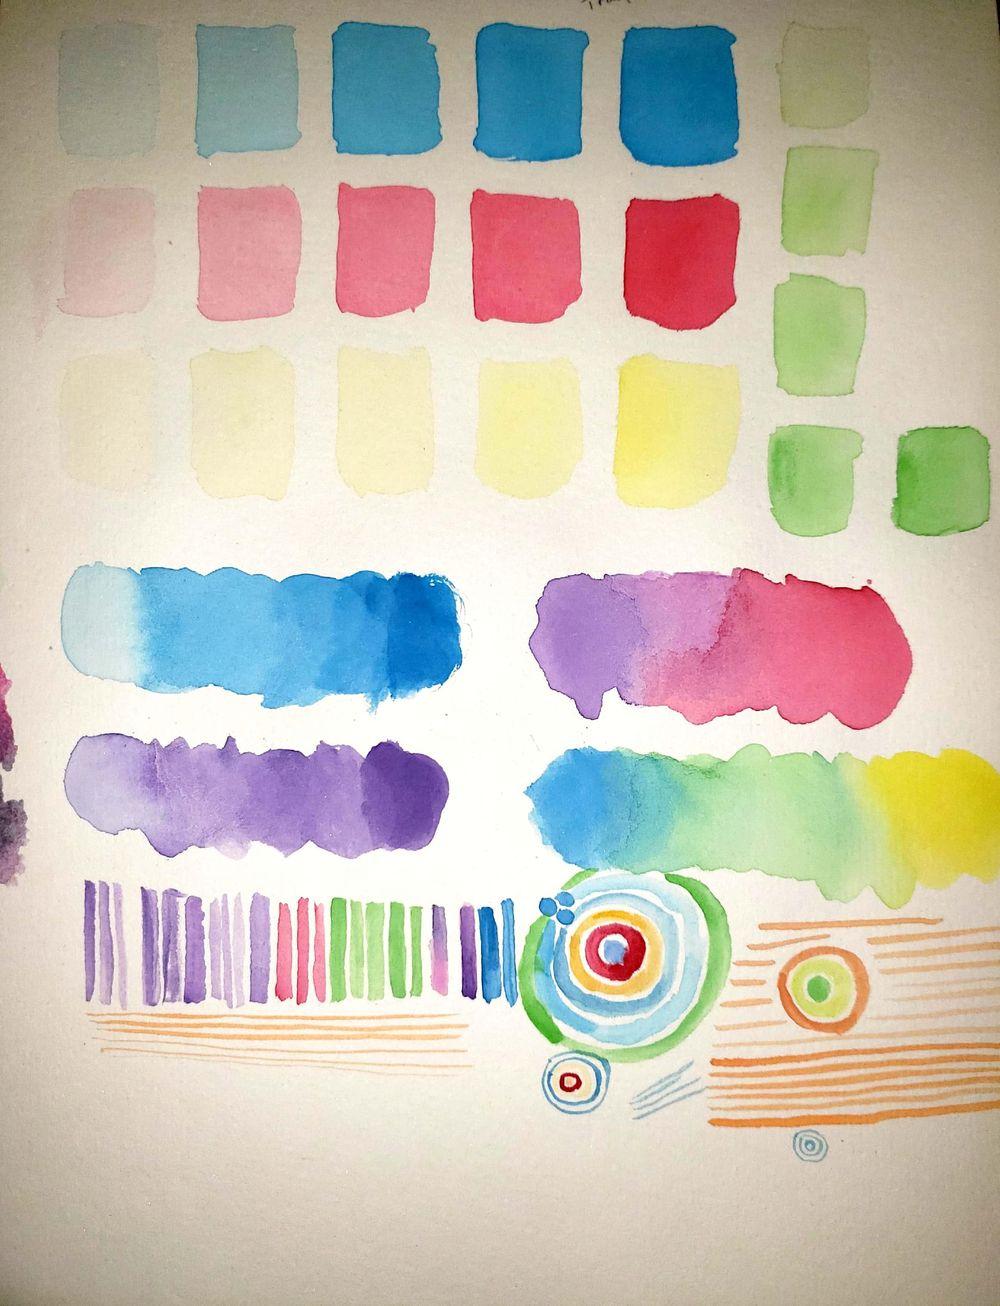 Wonderful Watercolors! - image 1 - student project